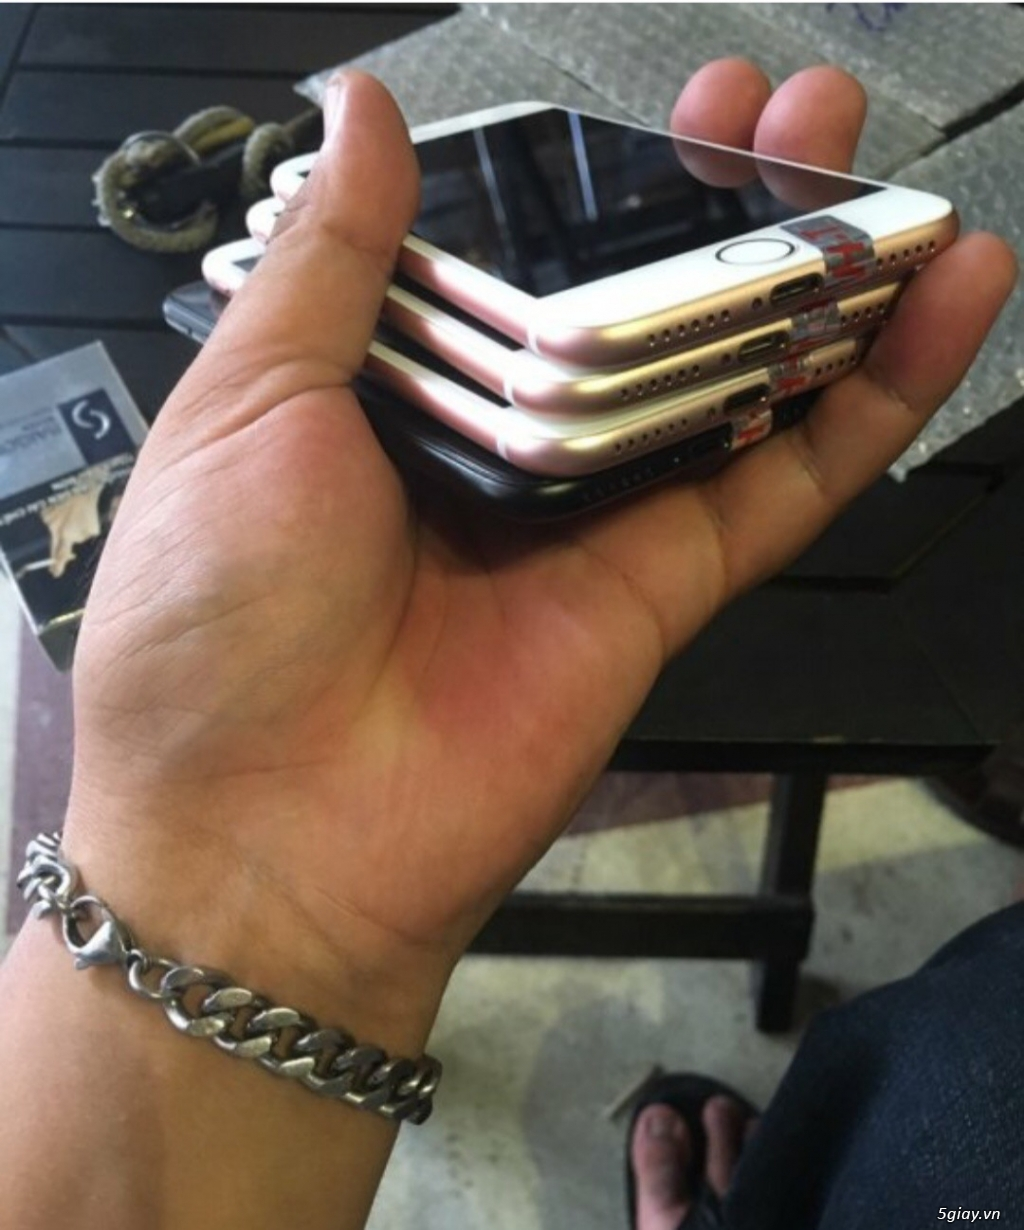 Iphone 7 32Gb + 128Gb Đủ Màu - 3